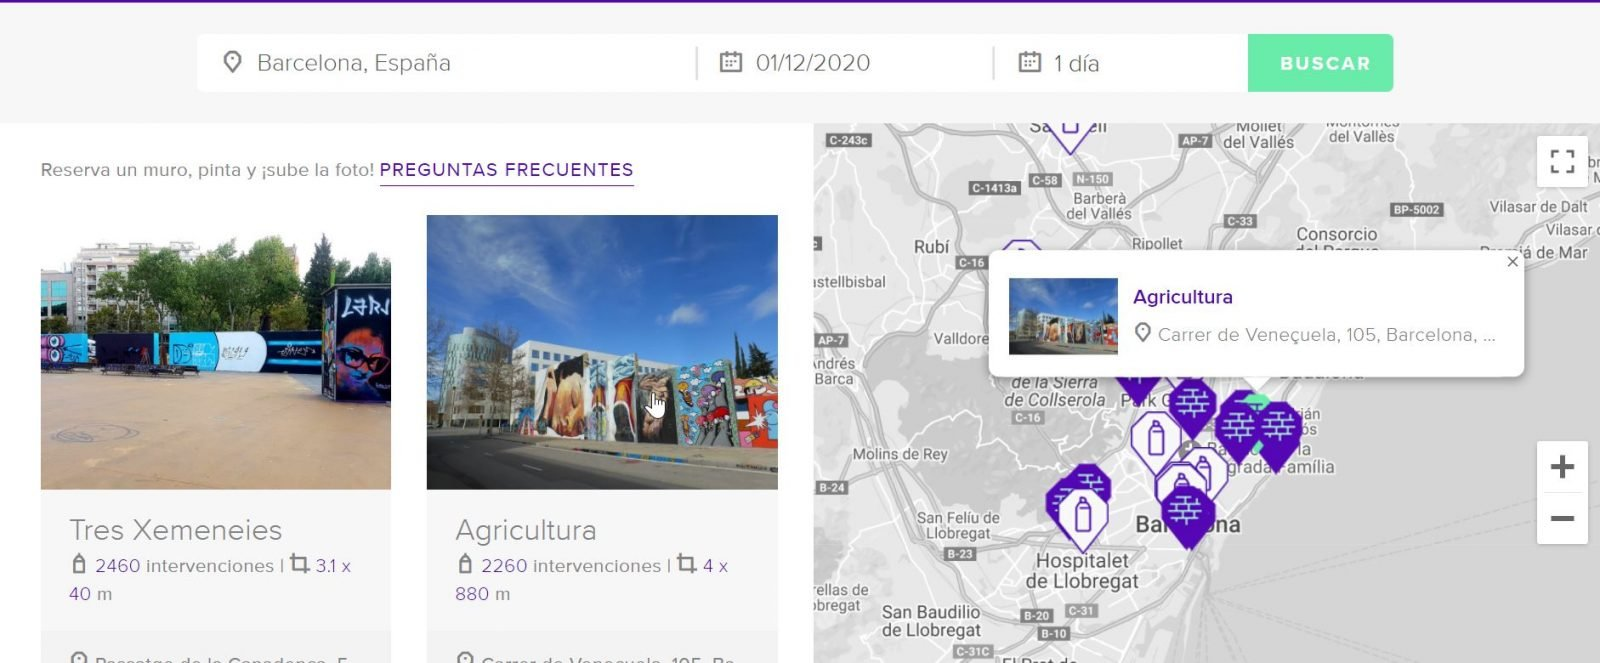 wall spot Barcelona